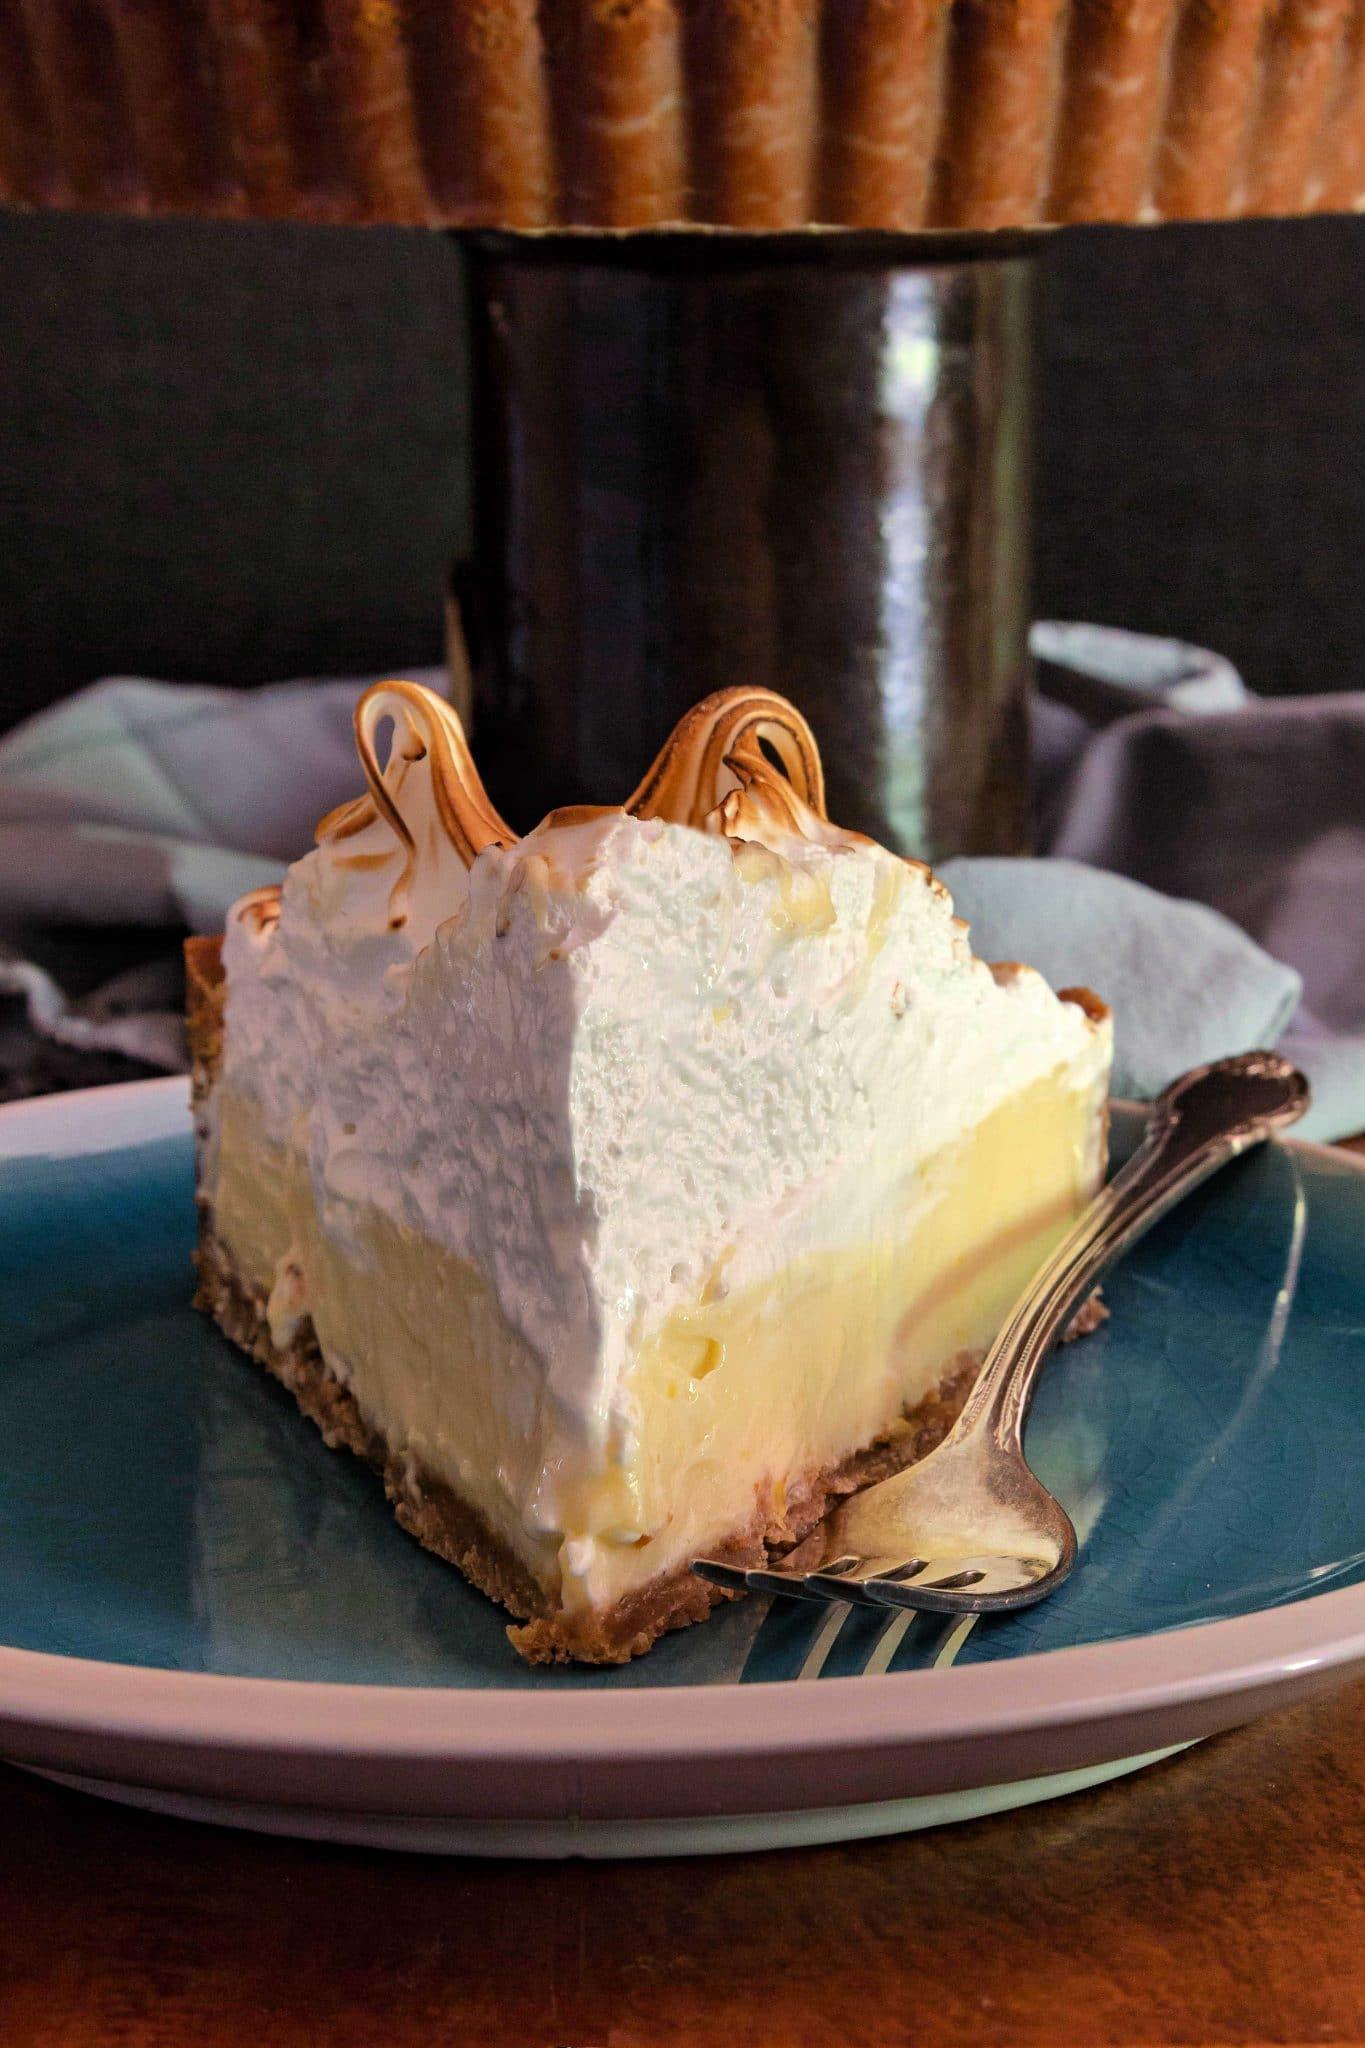 close up of sliced lemon meringue pie